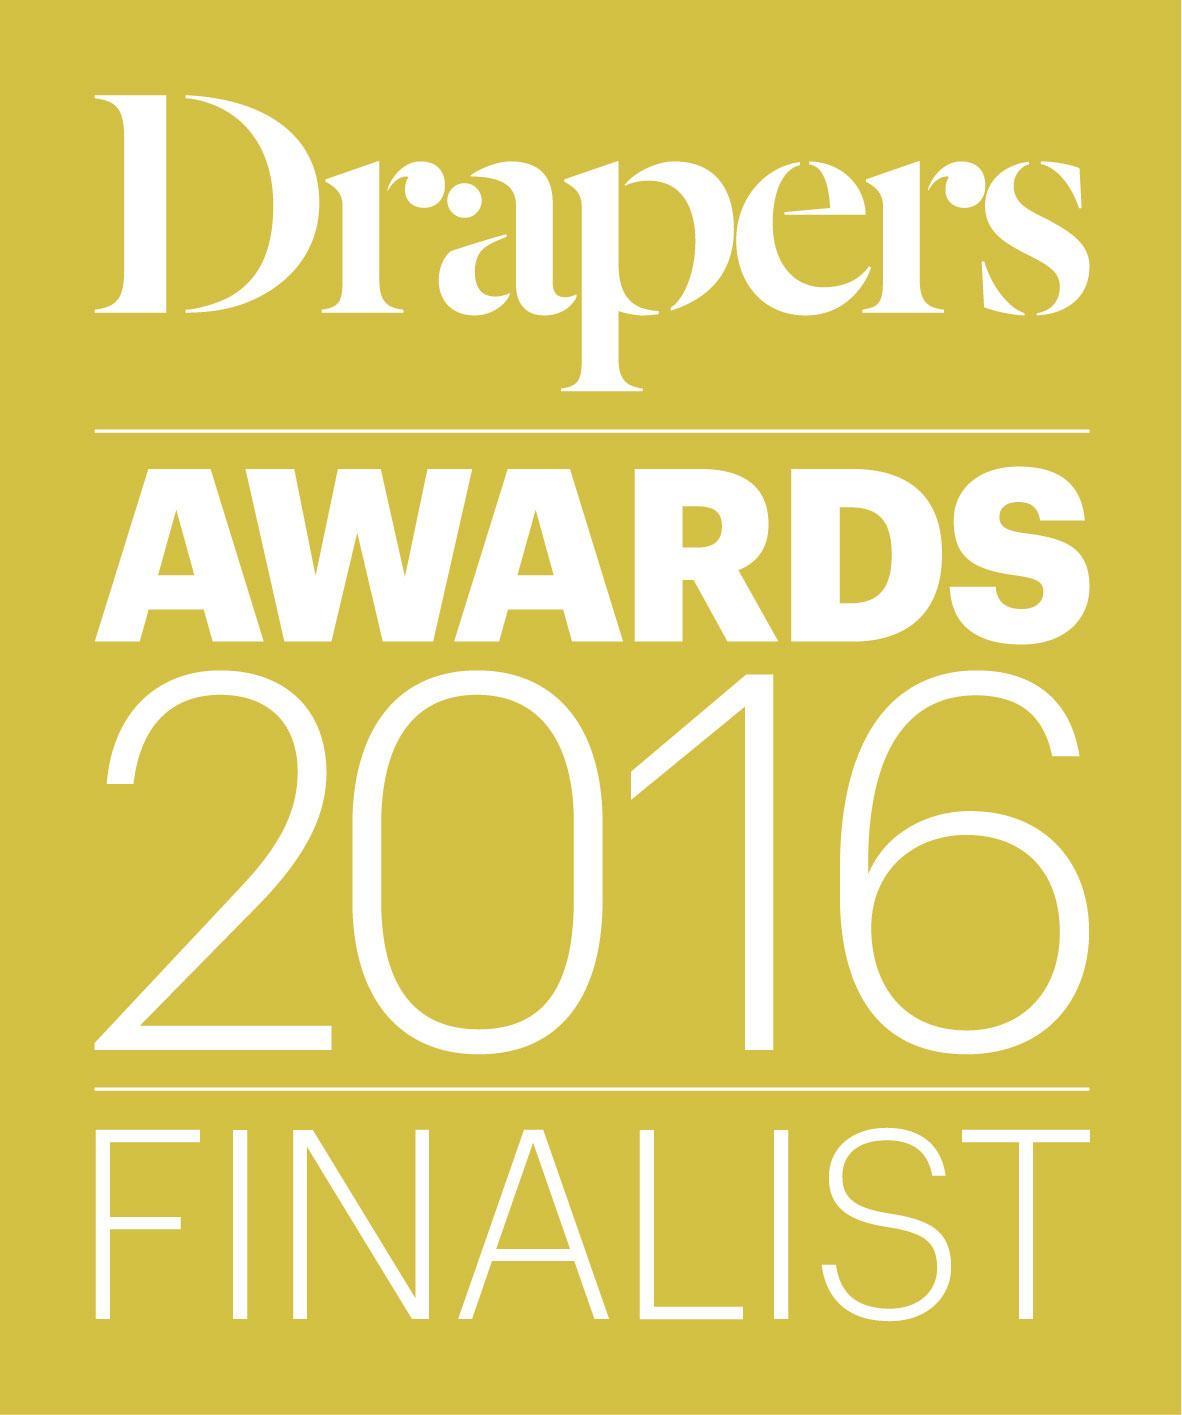 drapers-awards-2016